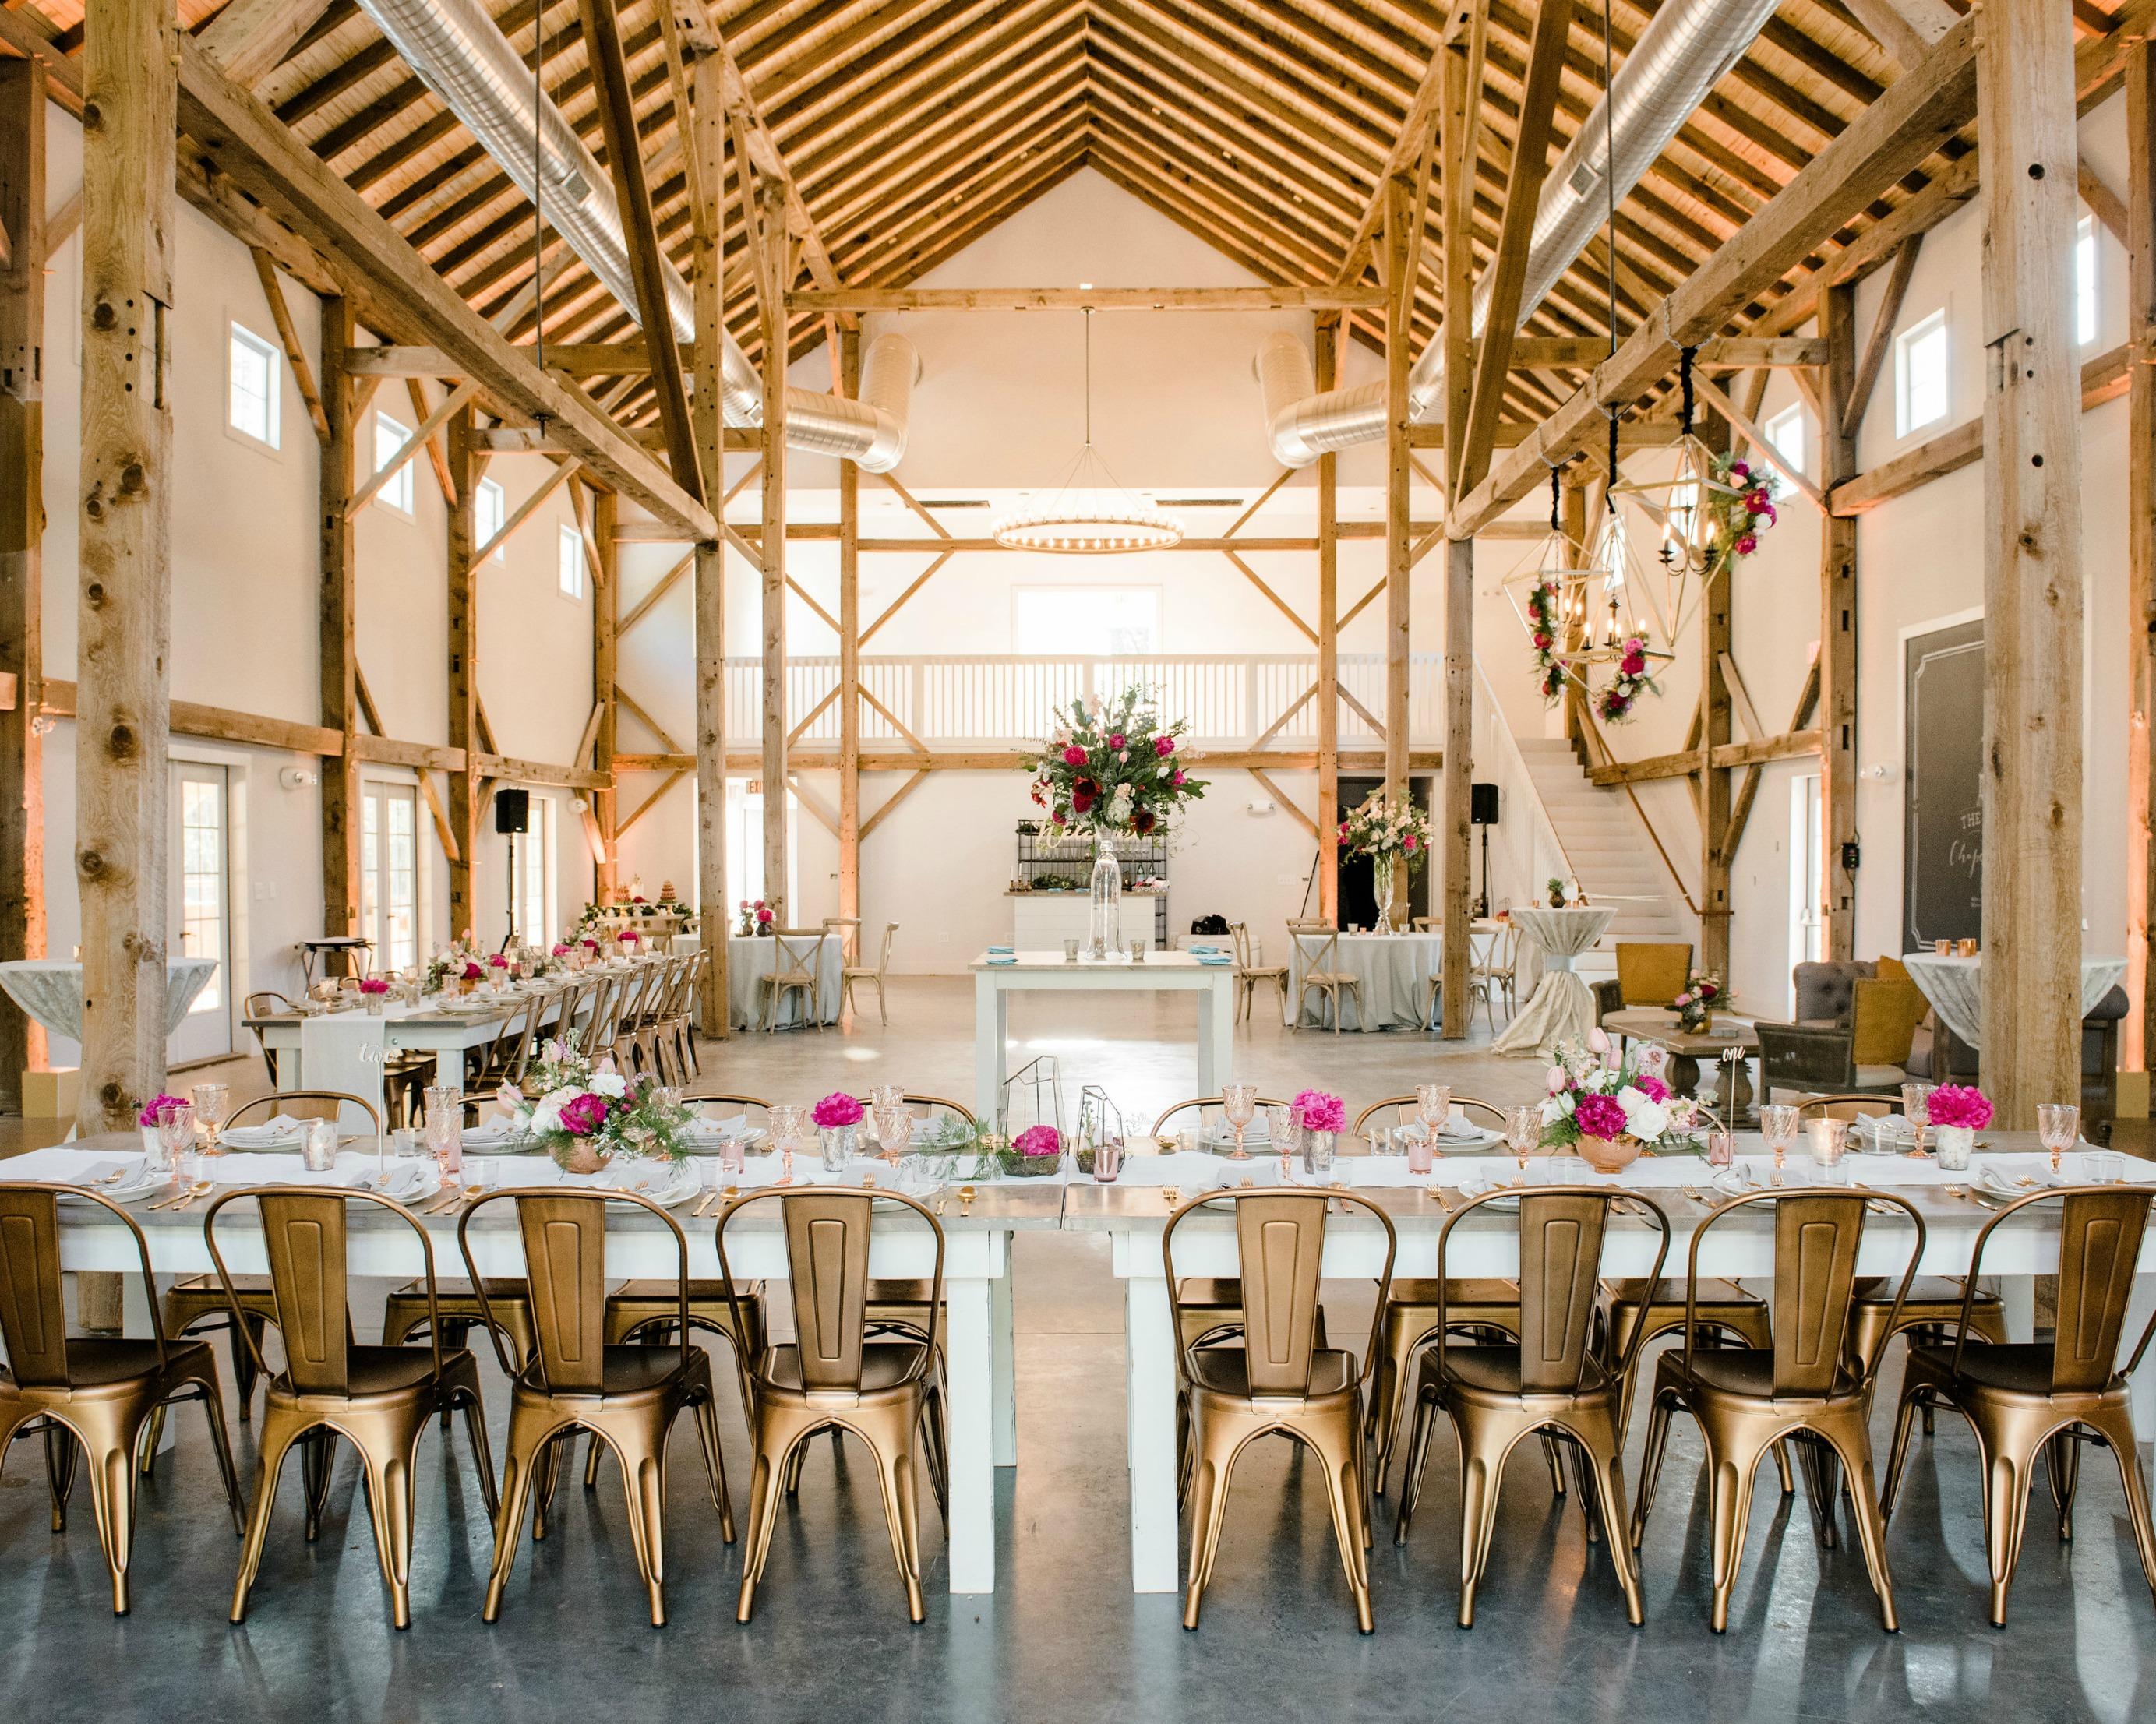 North Carolina Wedding Venue-Barn of Chapel Hill | Wedding ...